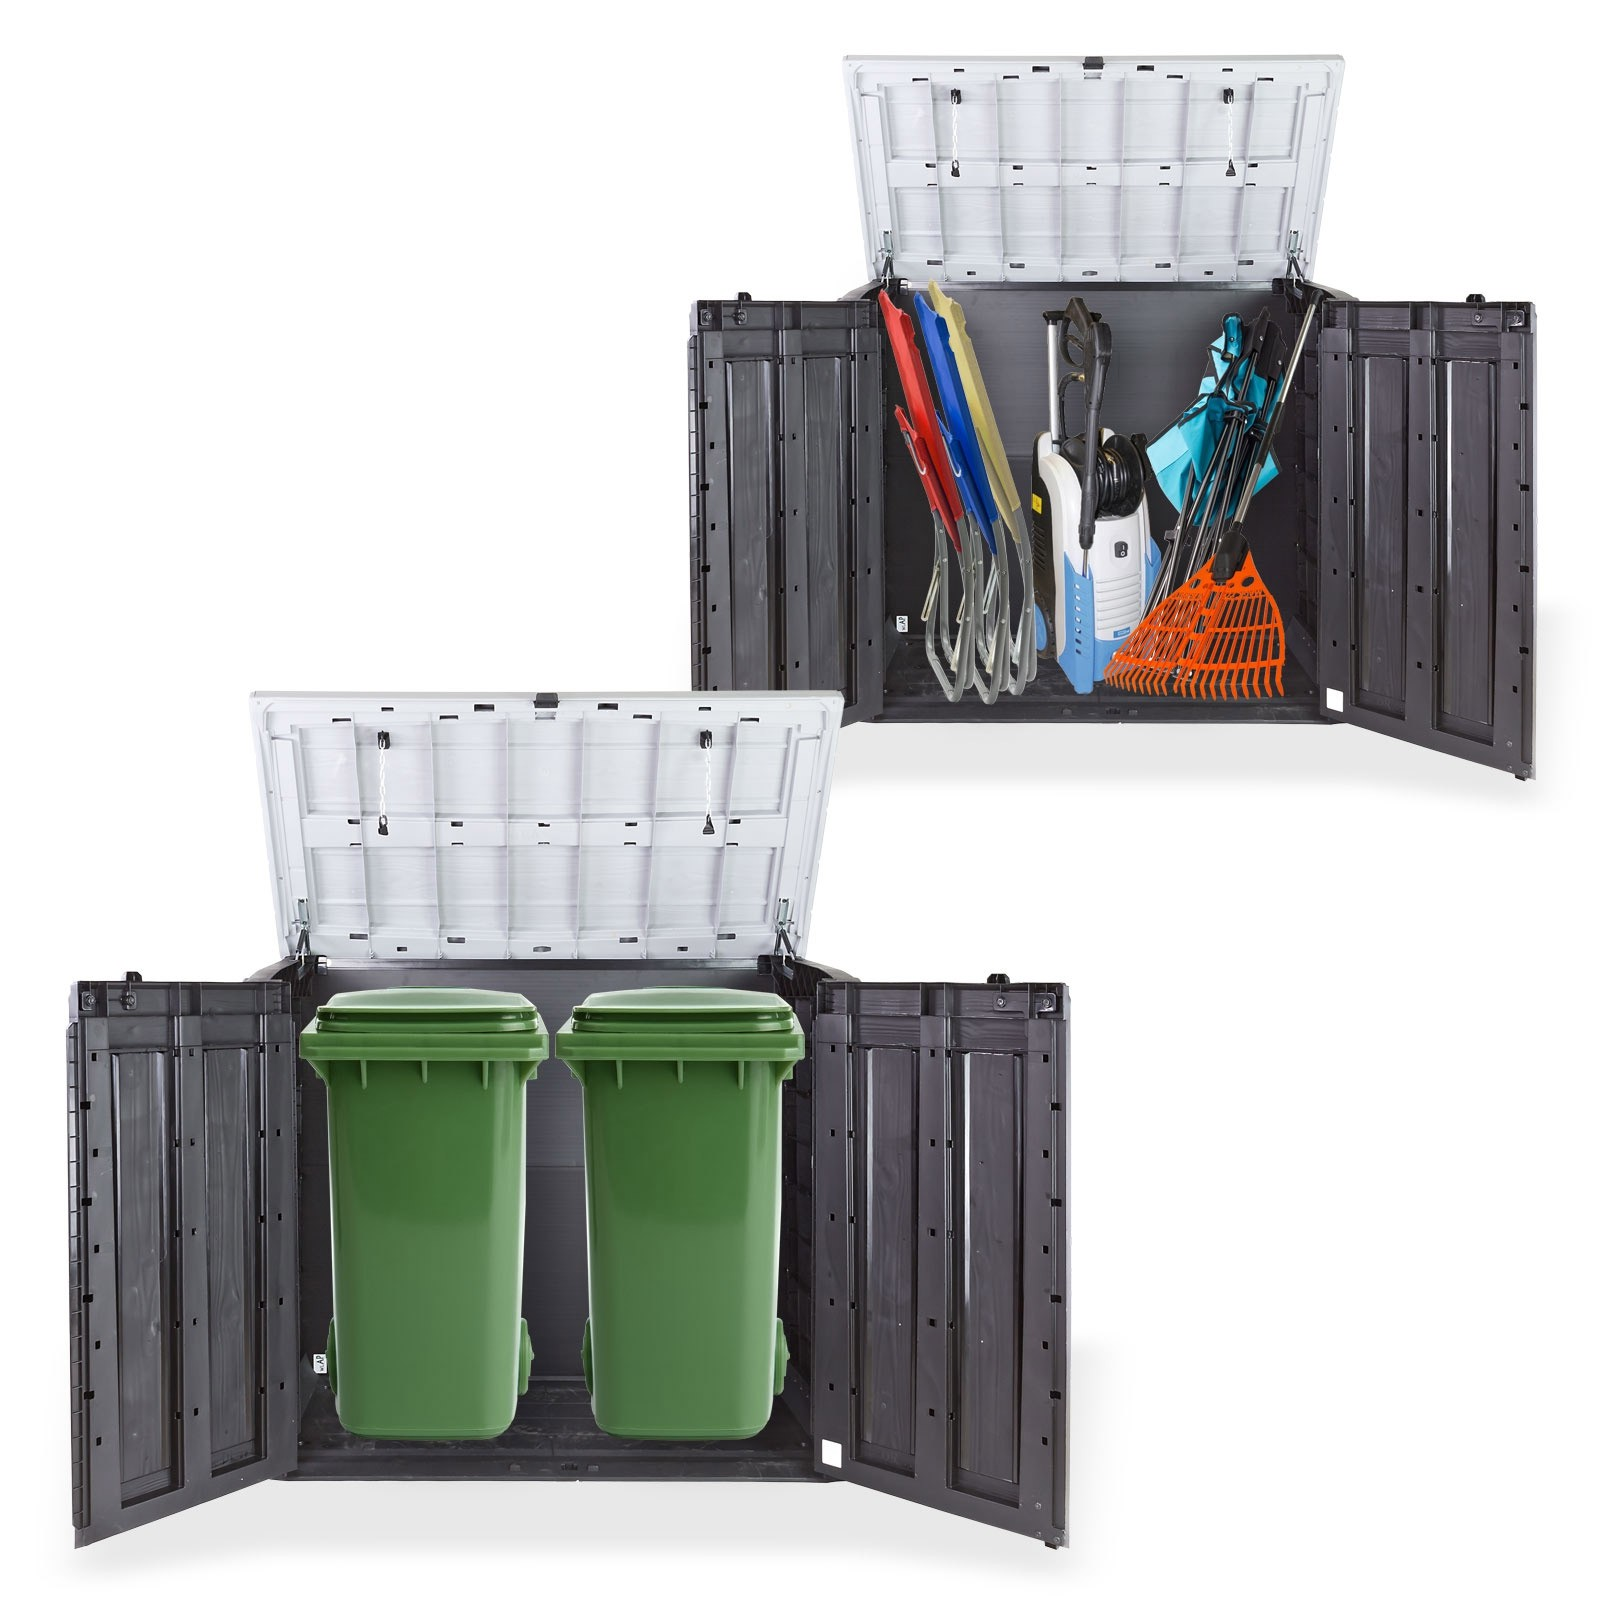 Mülltonnenbox Mülltonnenverk leidung Mülltonnen Sichtschutz für